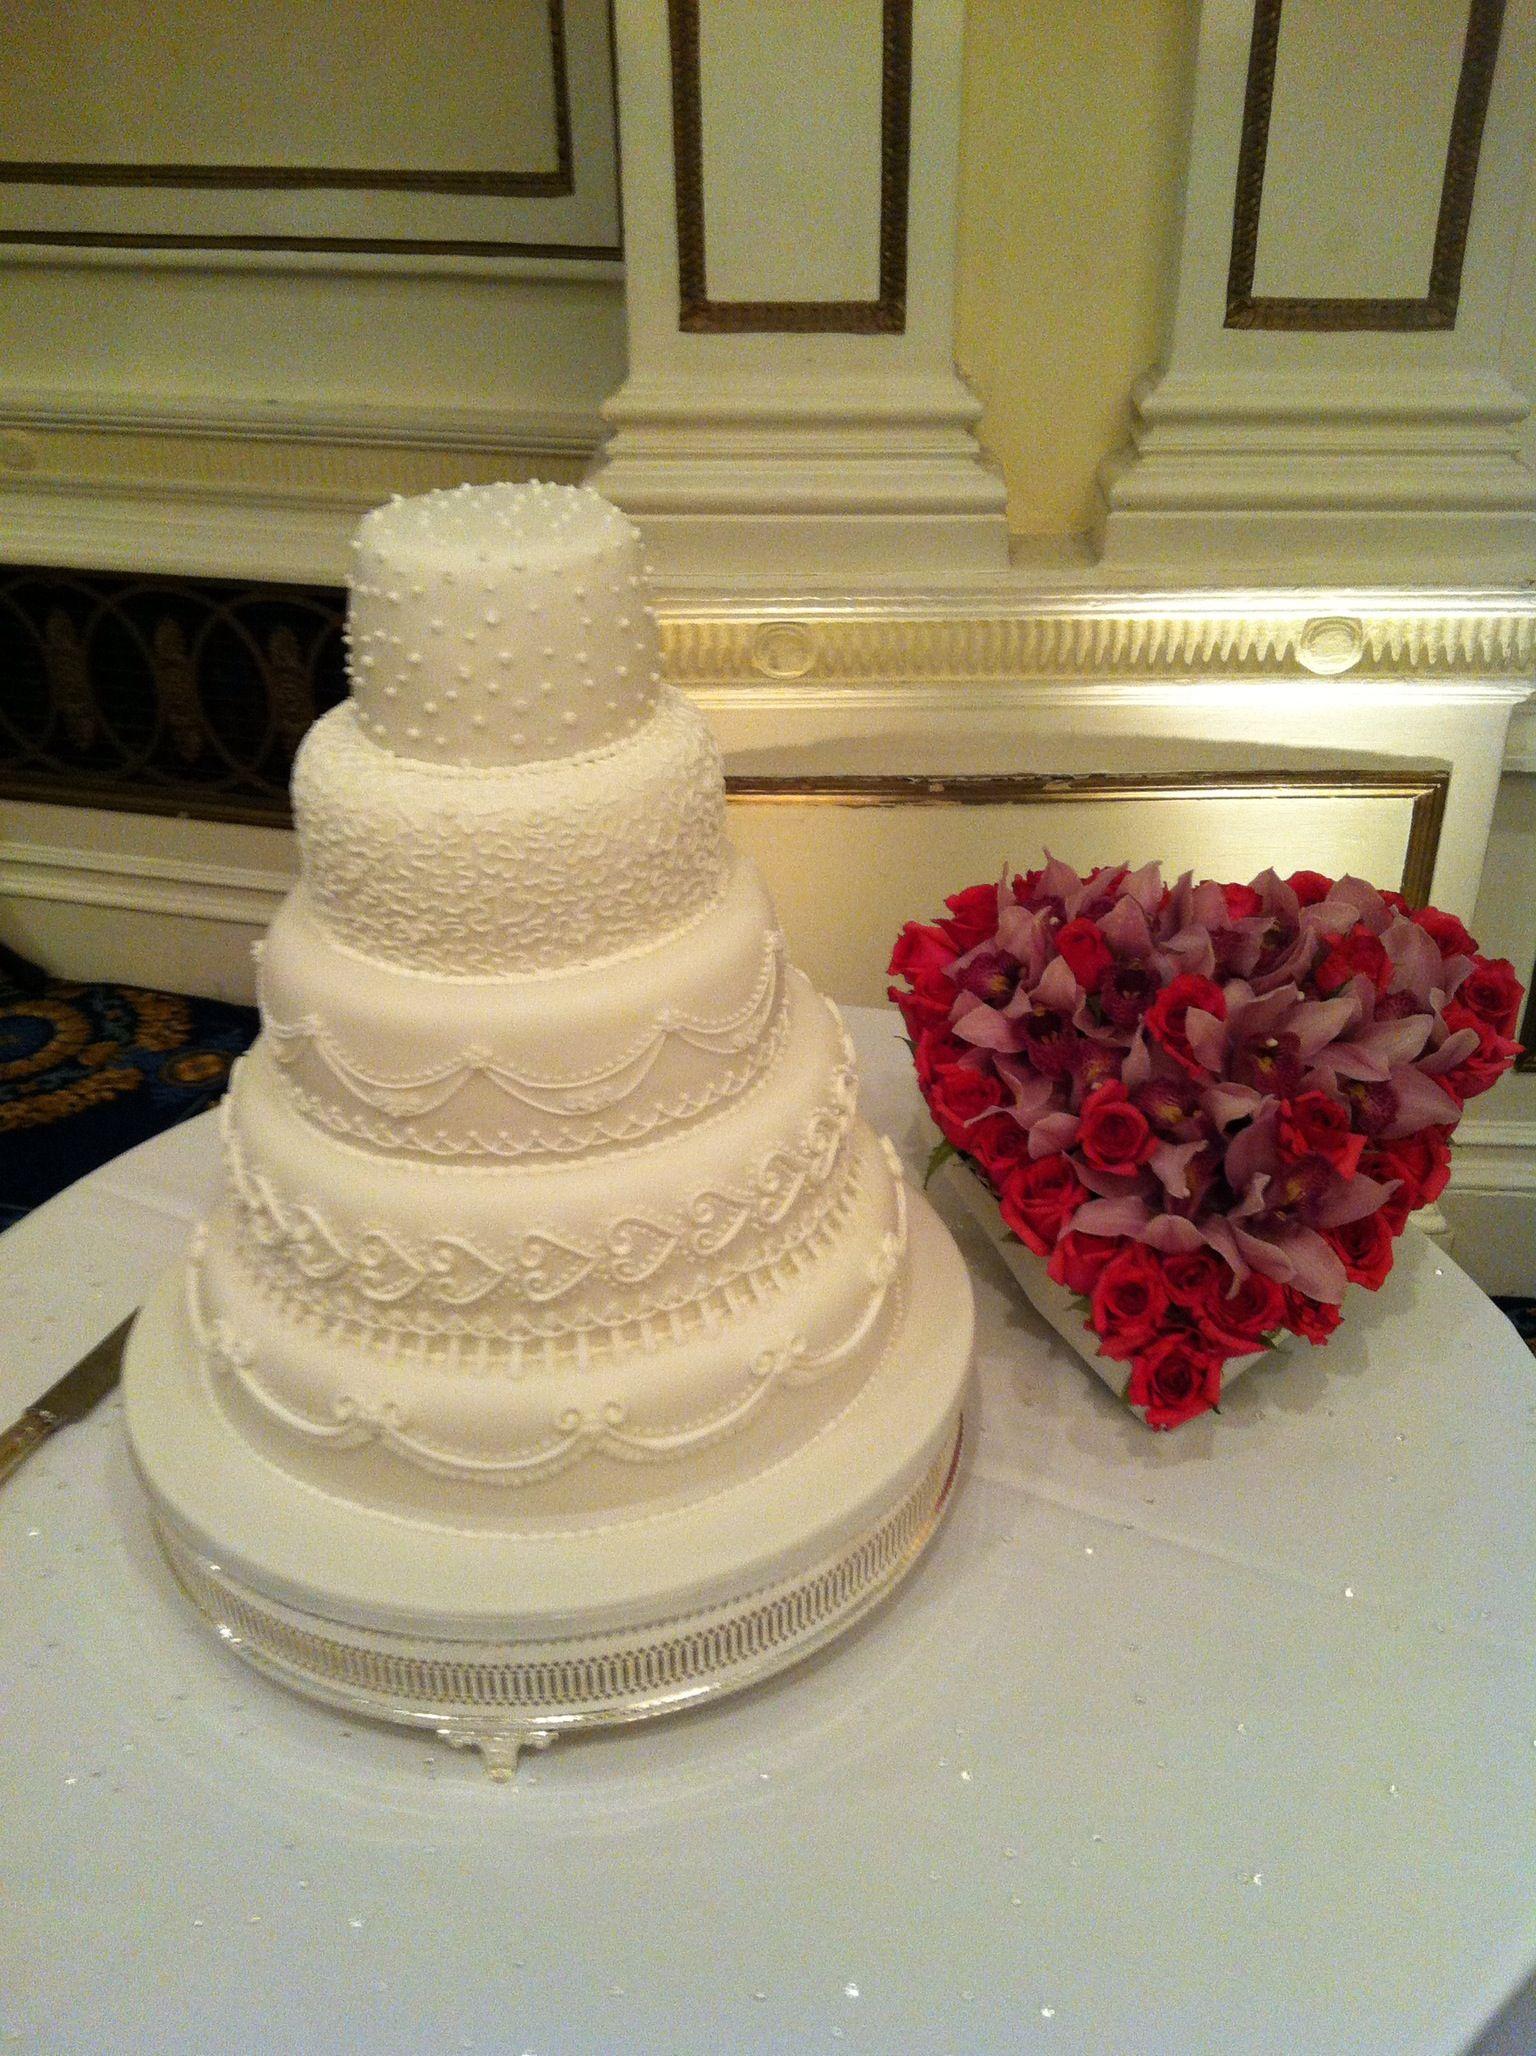 5 Tier Wedding Cake | Cakes | Pinterest | Tier wedding cakes ...